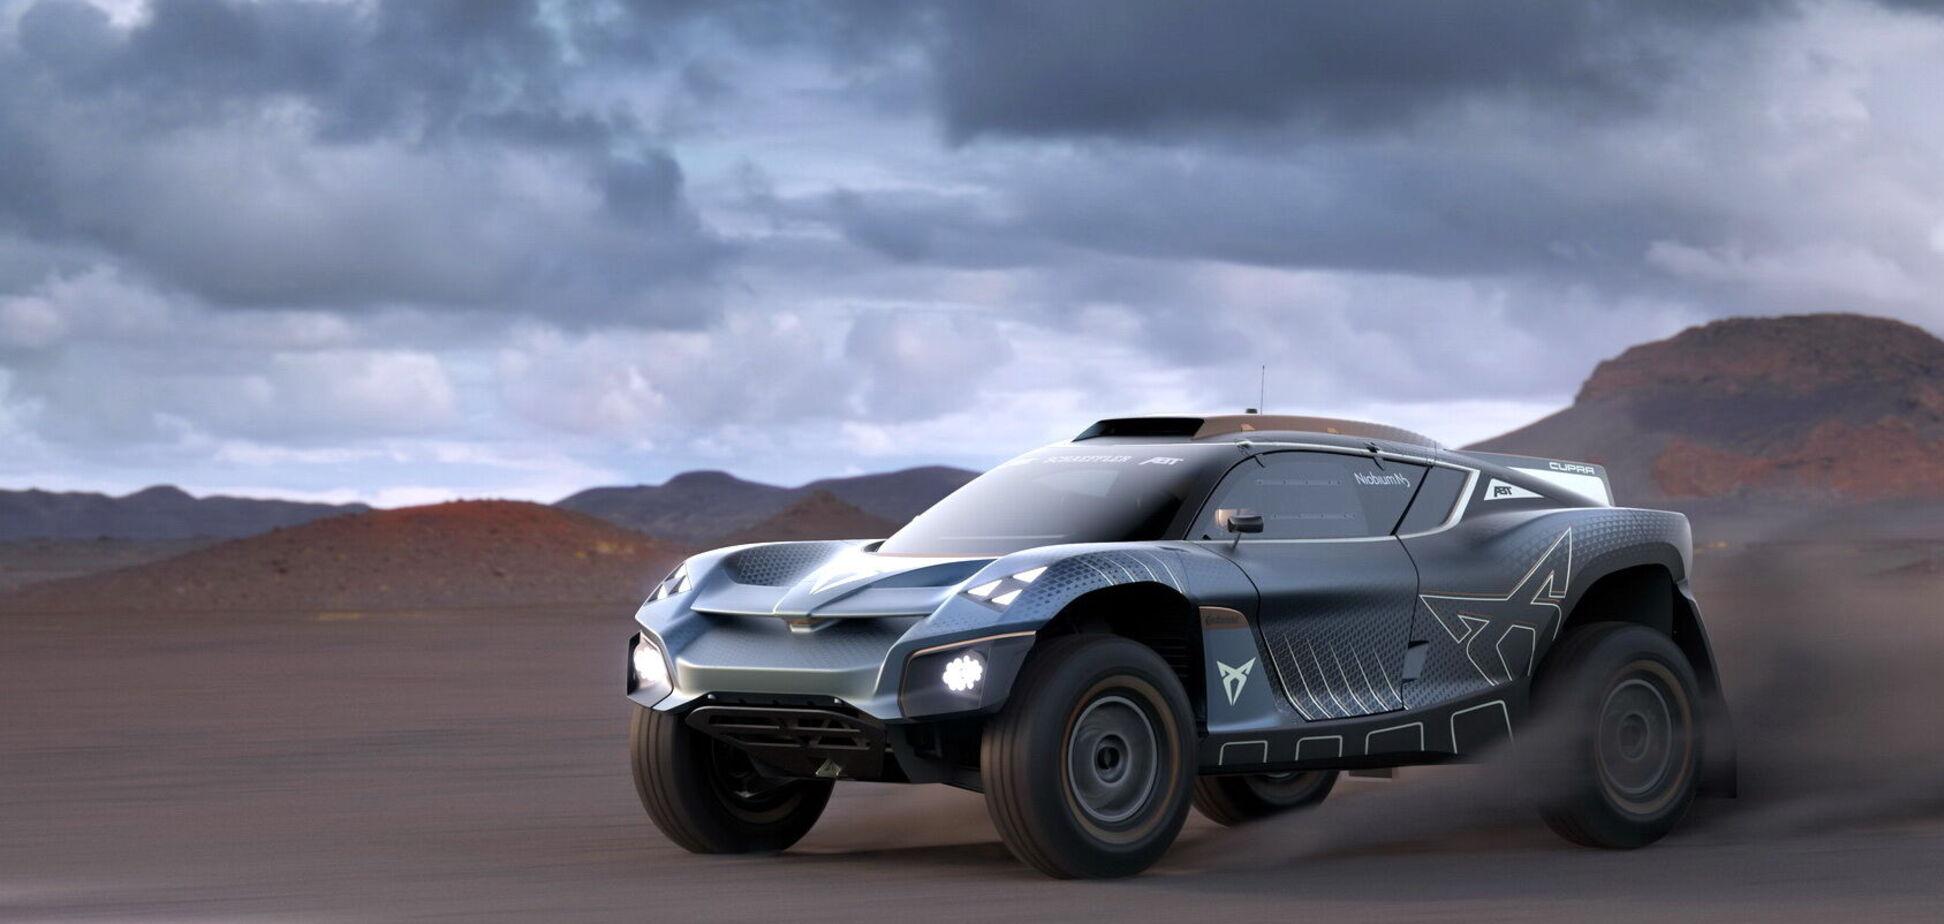 Cupra створила позашляховик для чемпіонату Extreme E